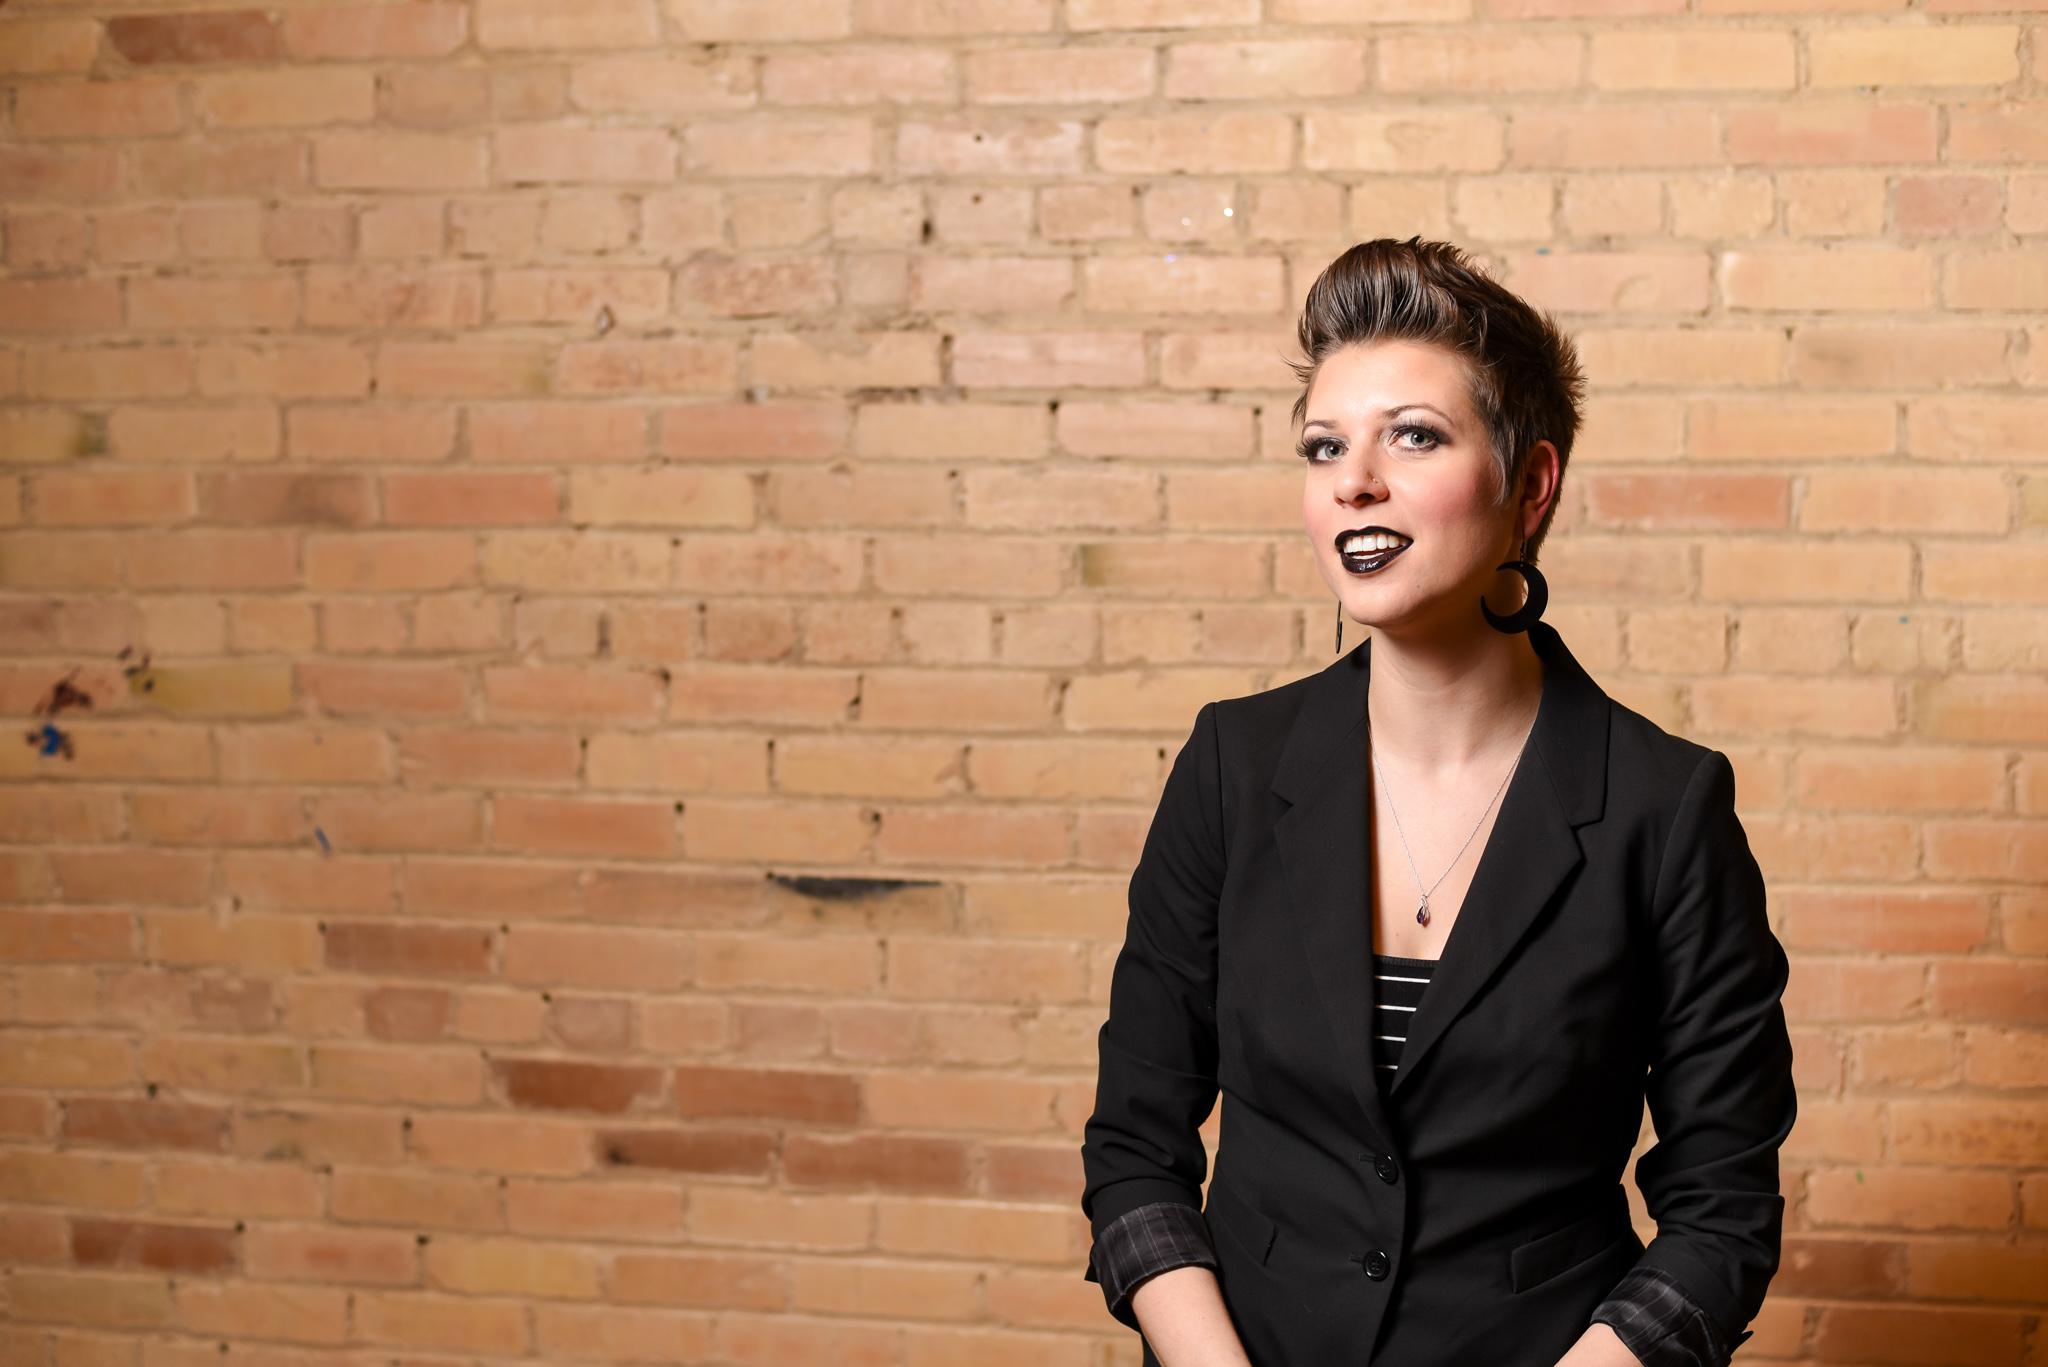 Fargo Portrait Photographer | Chelsea Joy Photography